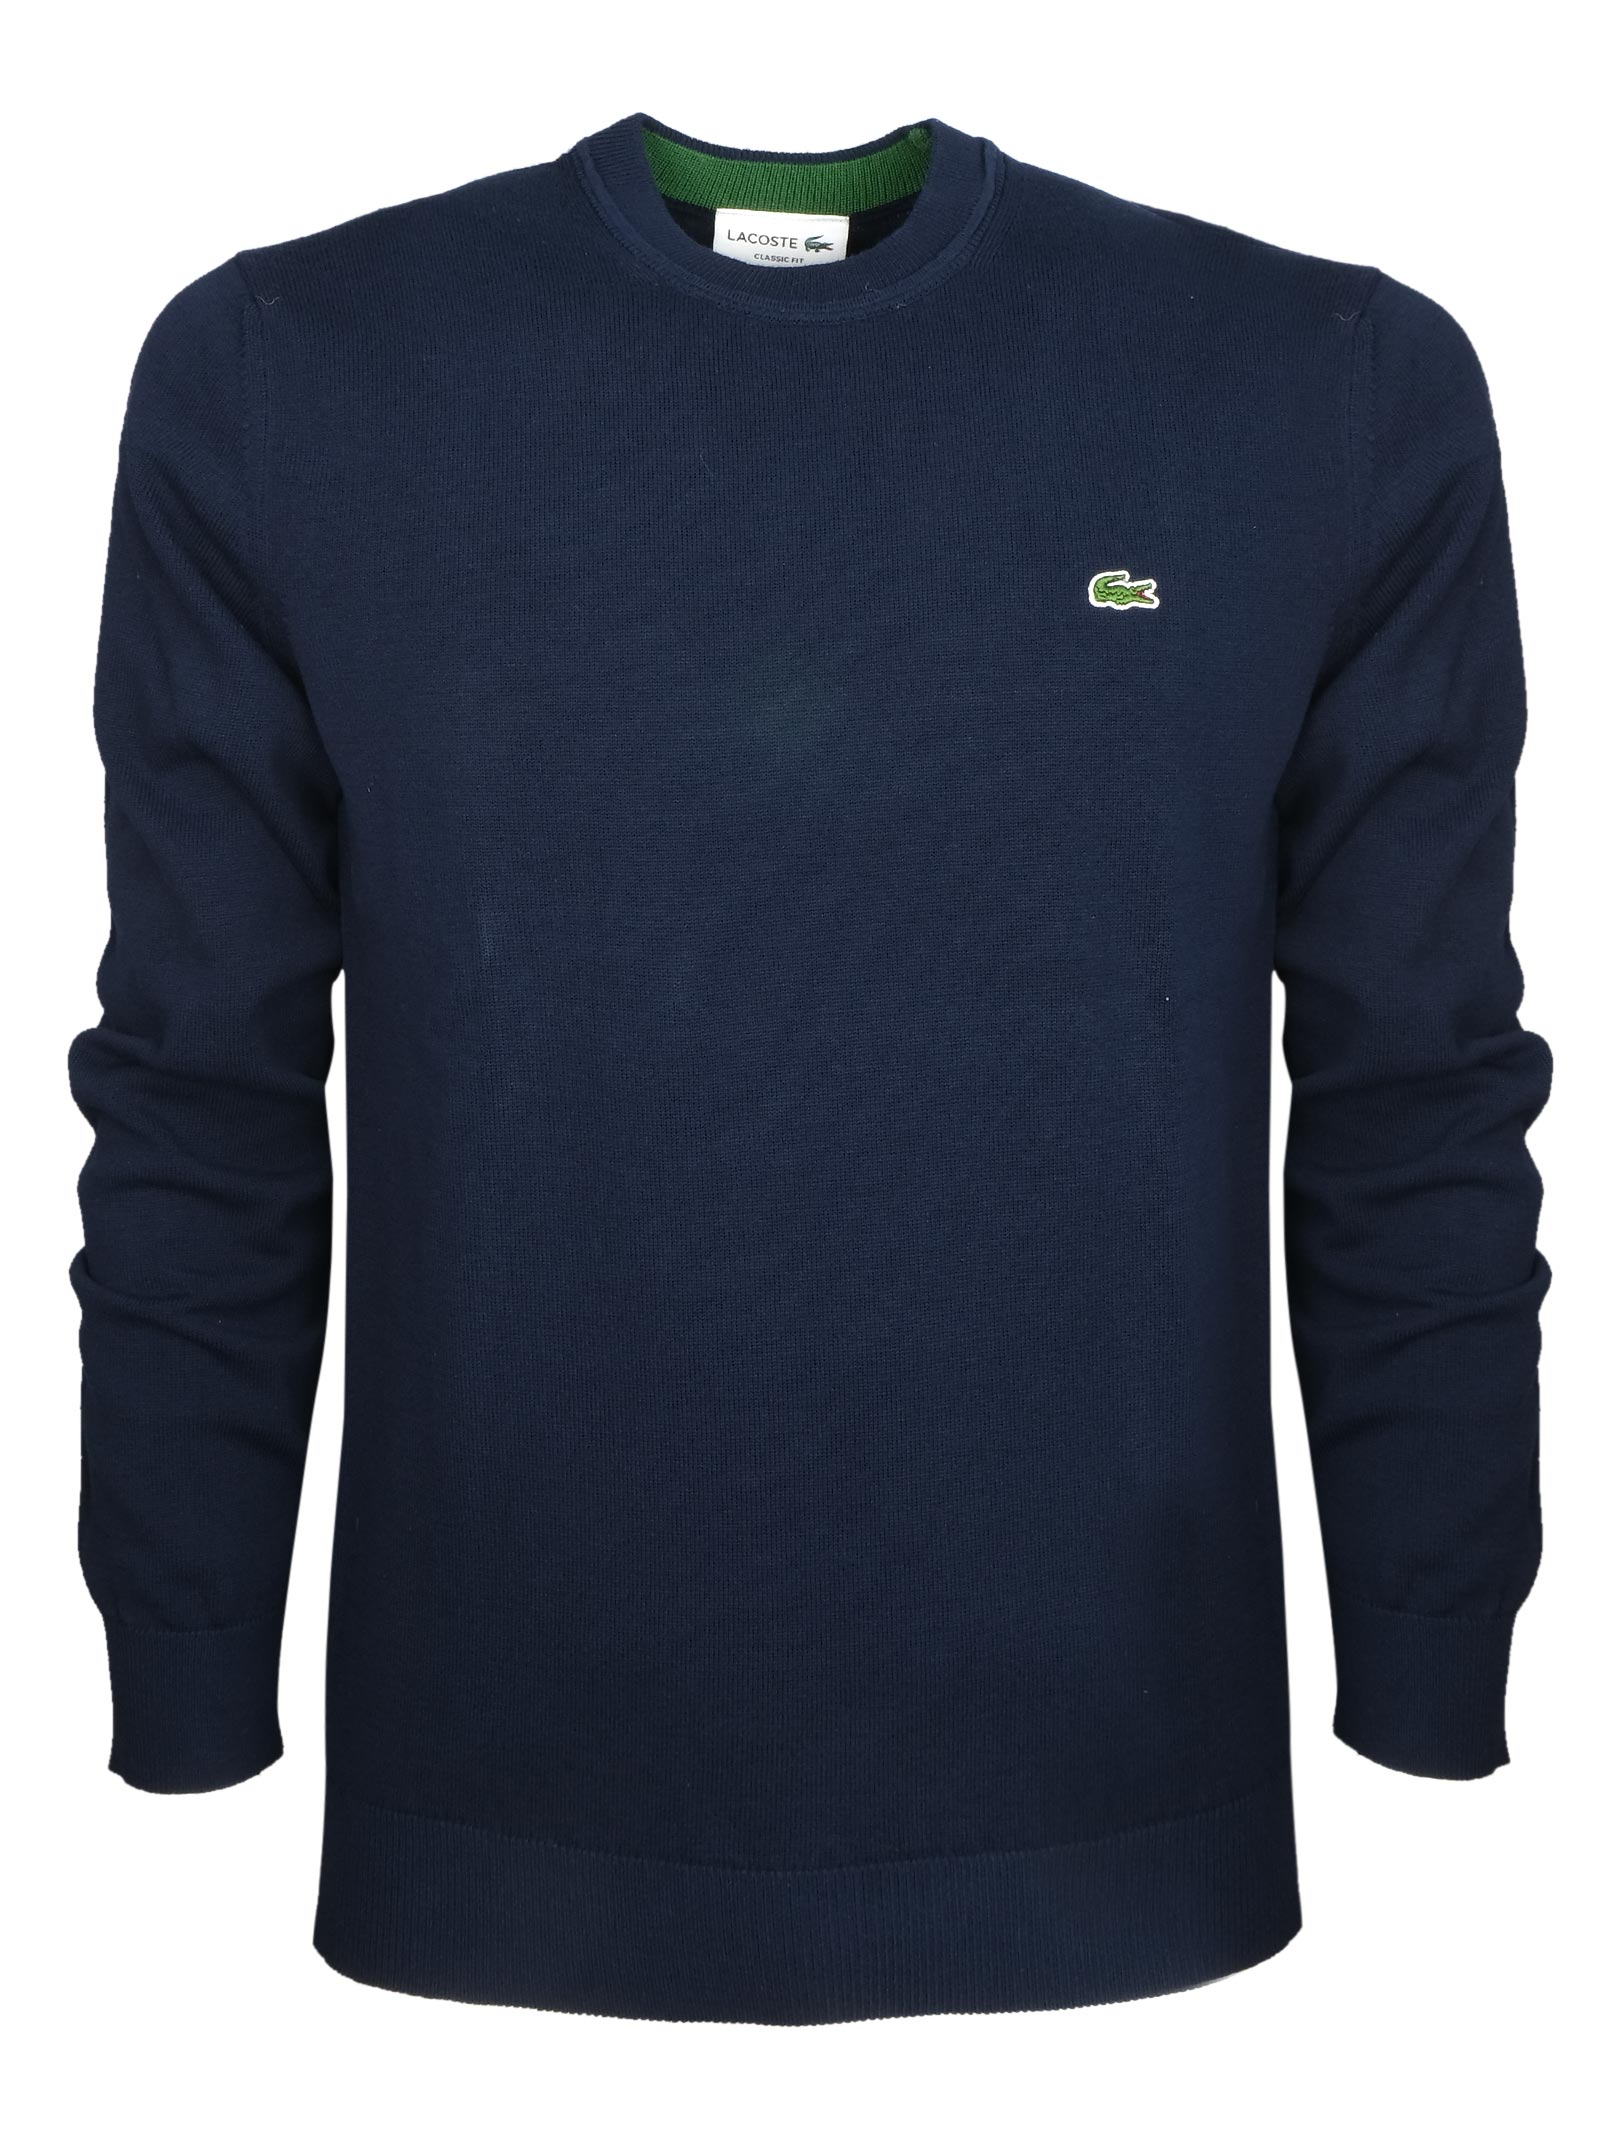 Cotton crew neck LACOSTE | Knitwear | AH2193166